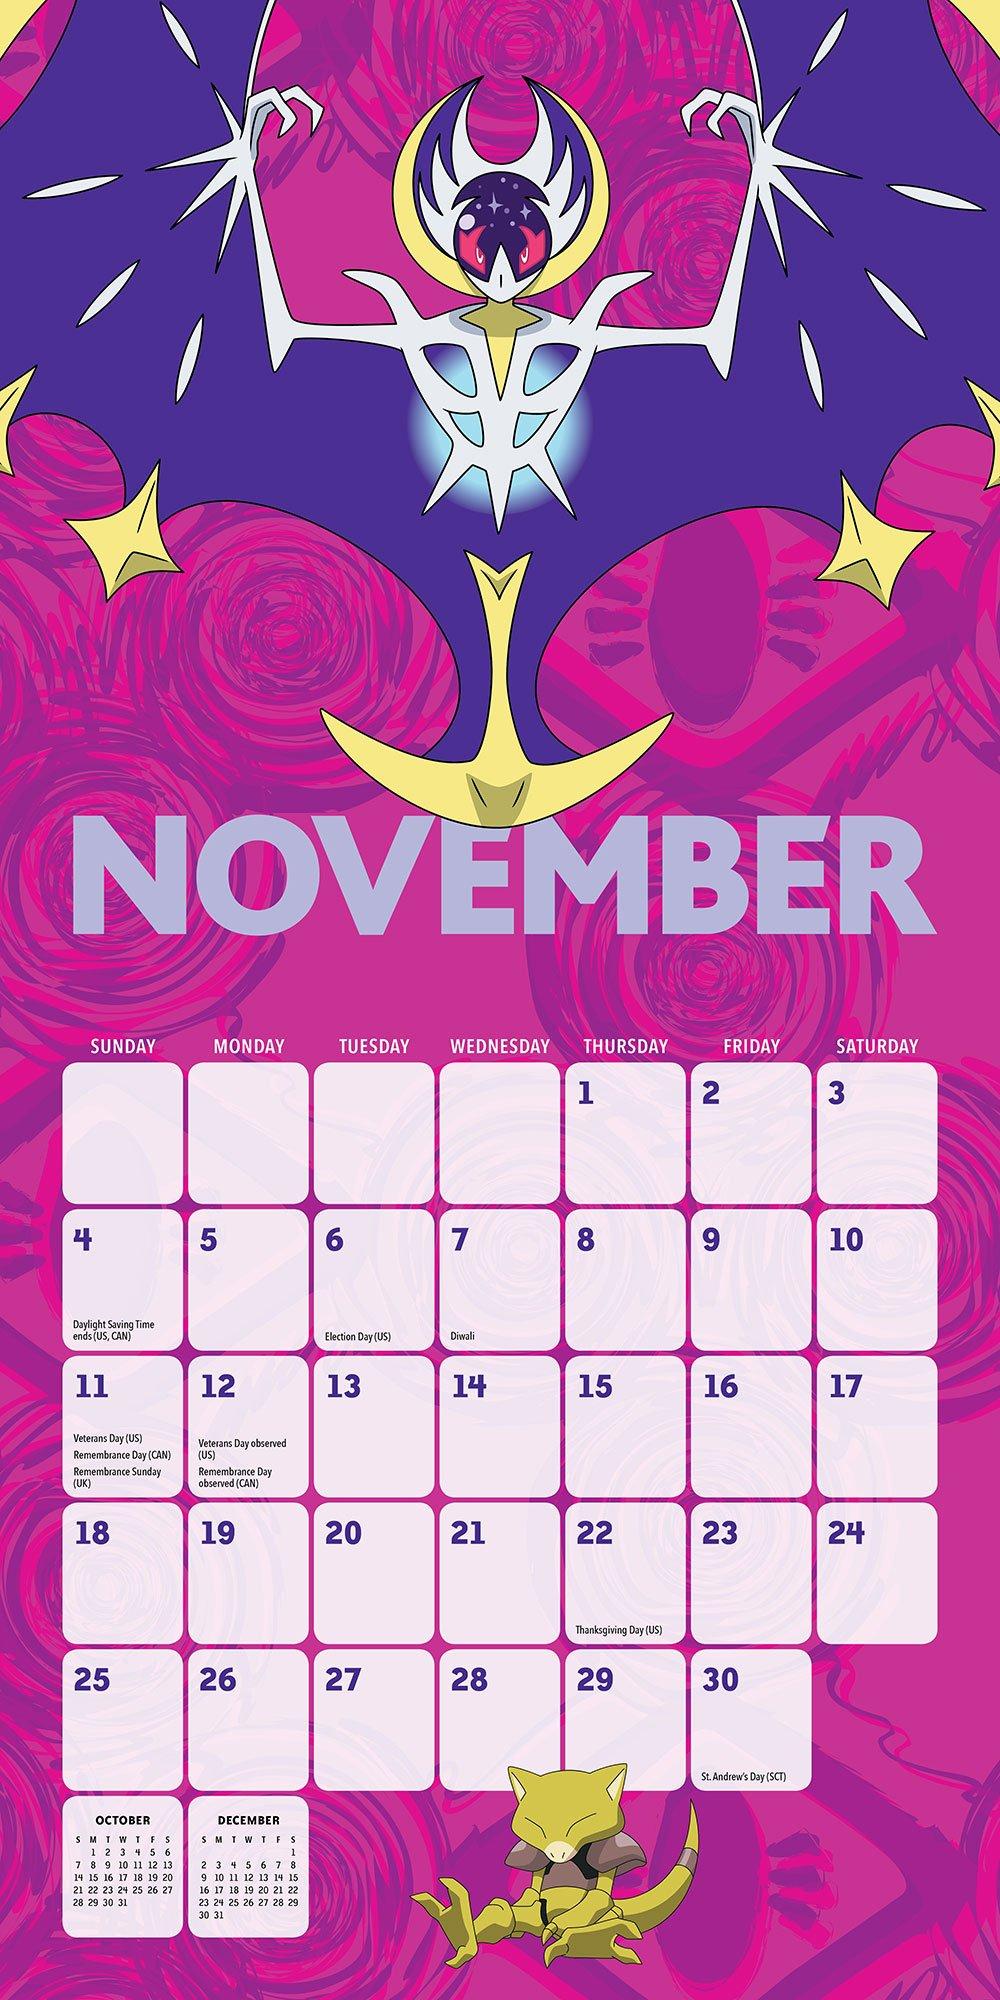 Pikachu December 2019 Calendar Pokemon Wall Calendar: Pokémon: 9781419728105: Amazon.com: Books